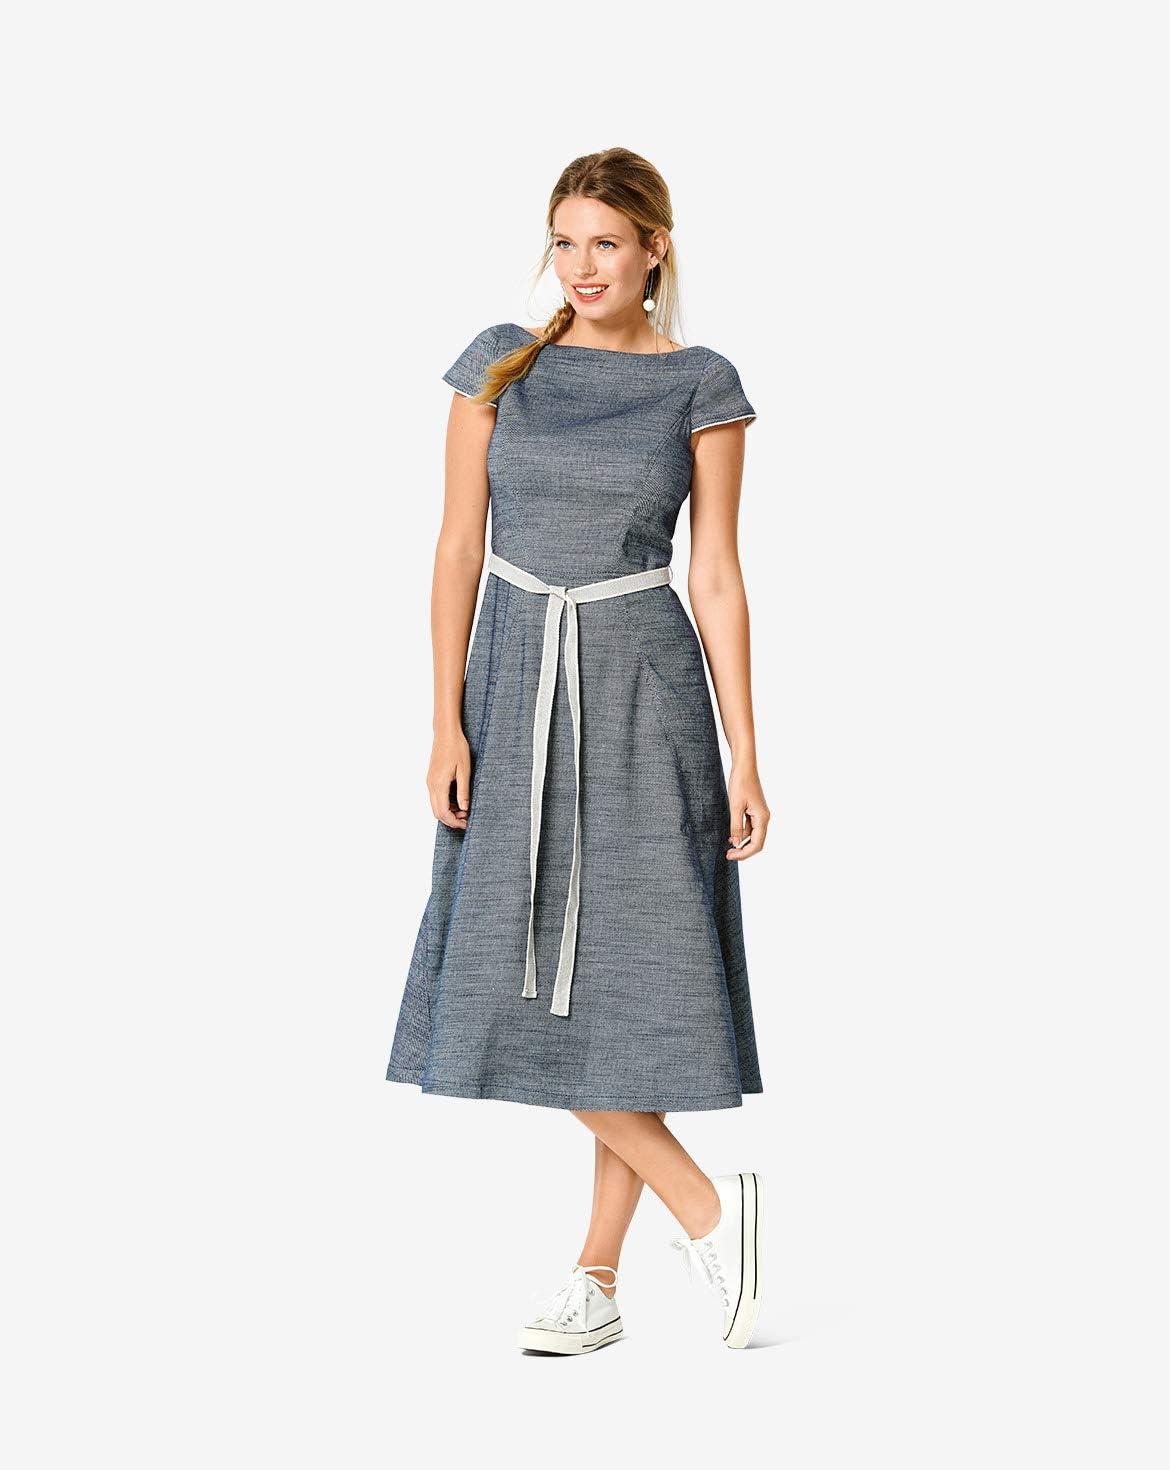 Level 3 f/ür Fortgeschrittene Damen Burda Schnittmuster 6209 Jacquard-Kleid selber n/ähen